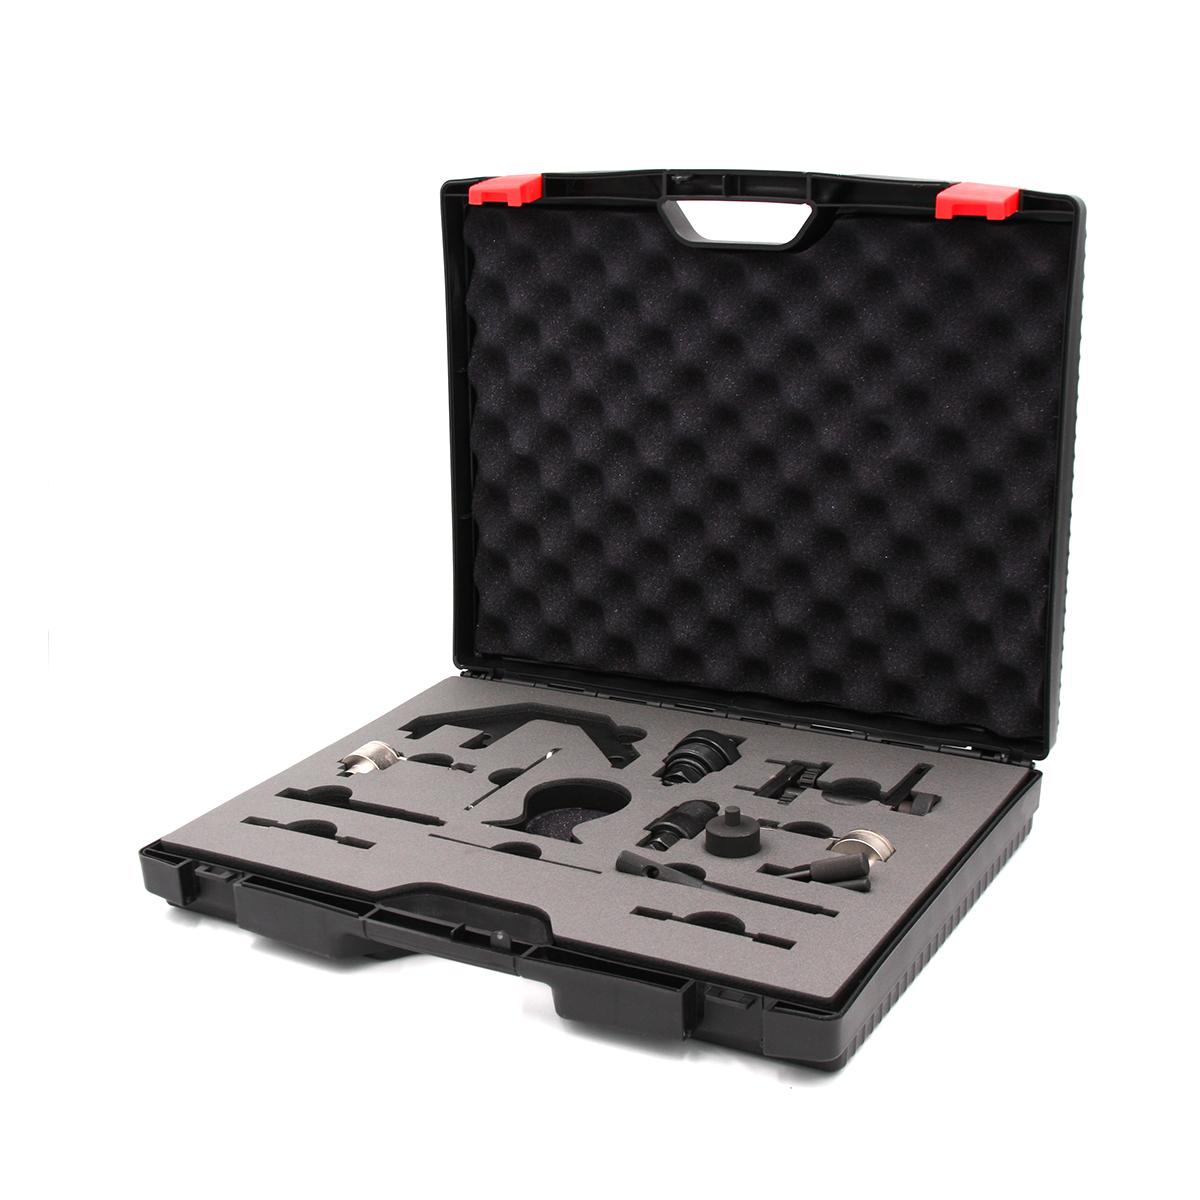 Набор для установки ГРМ LAND ROVER DIESEL KIT1 Car-Tool CT-Z0501